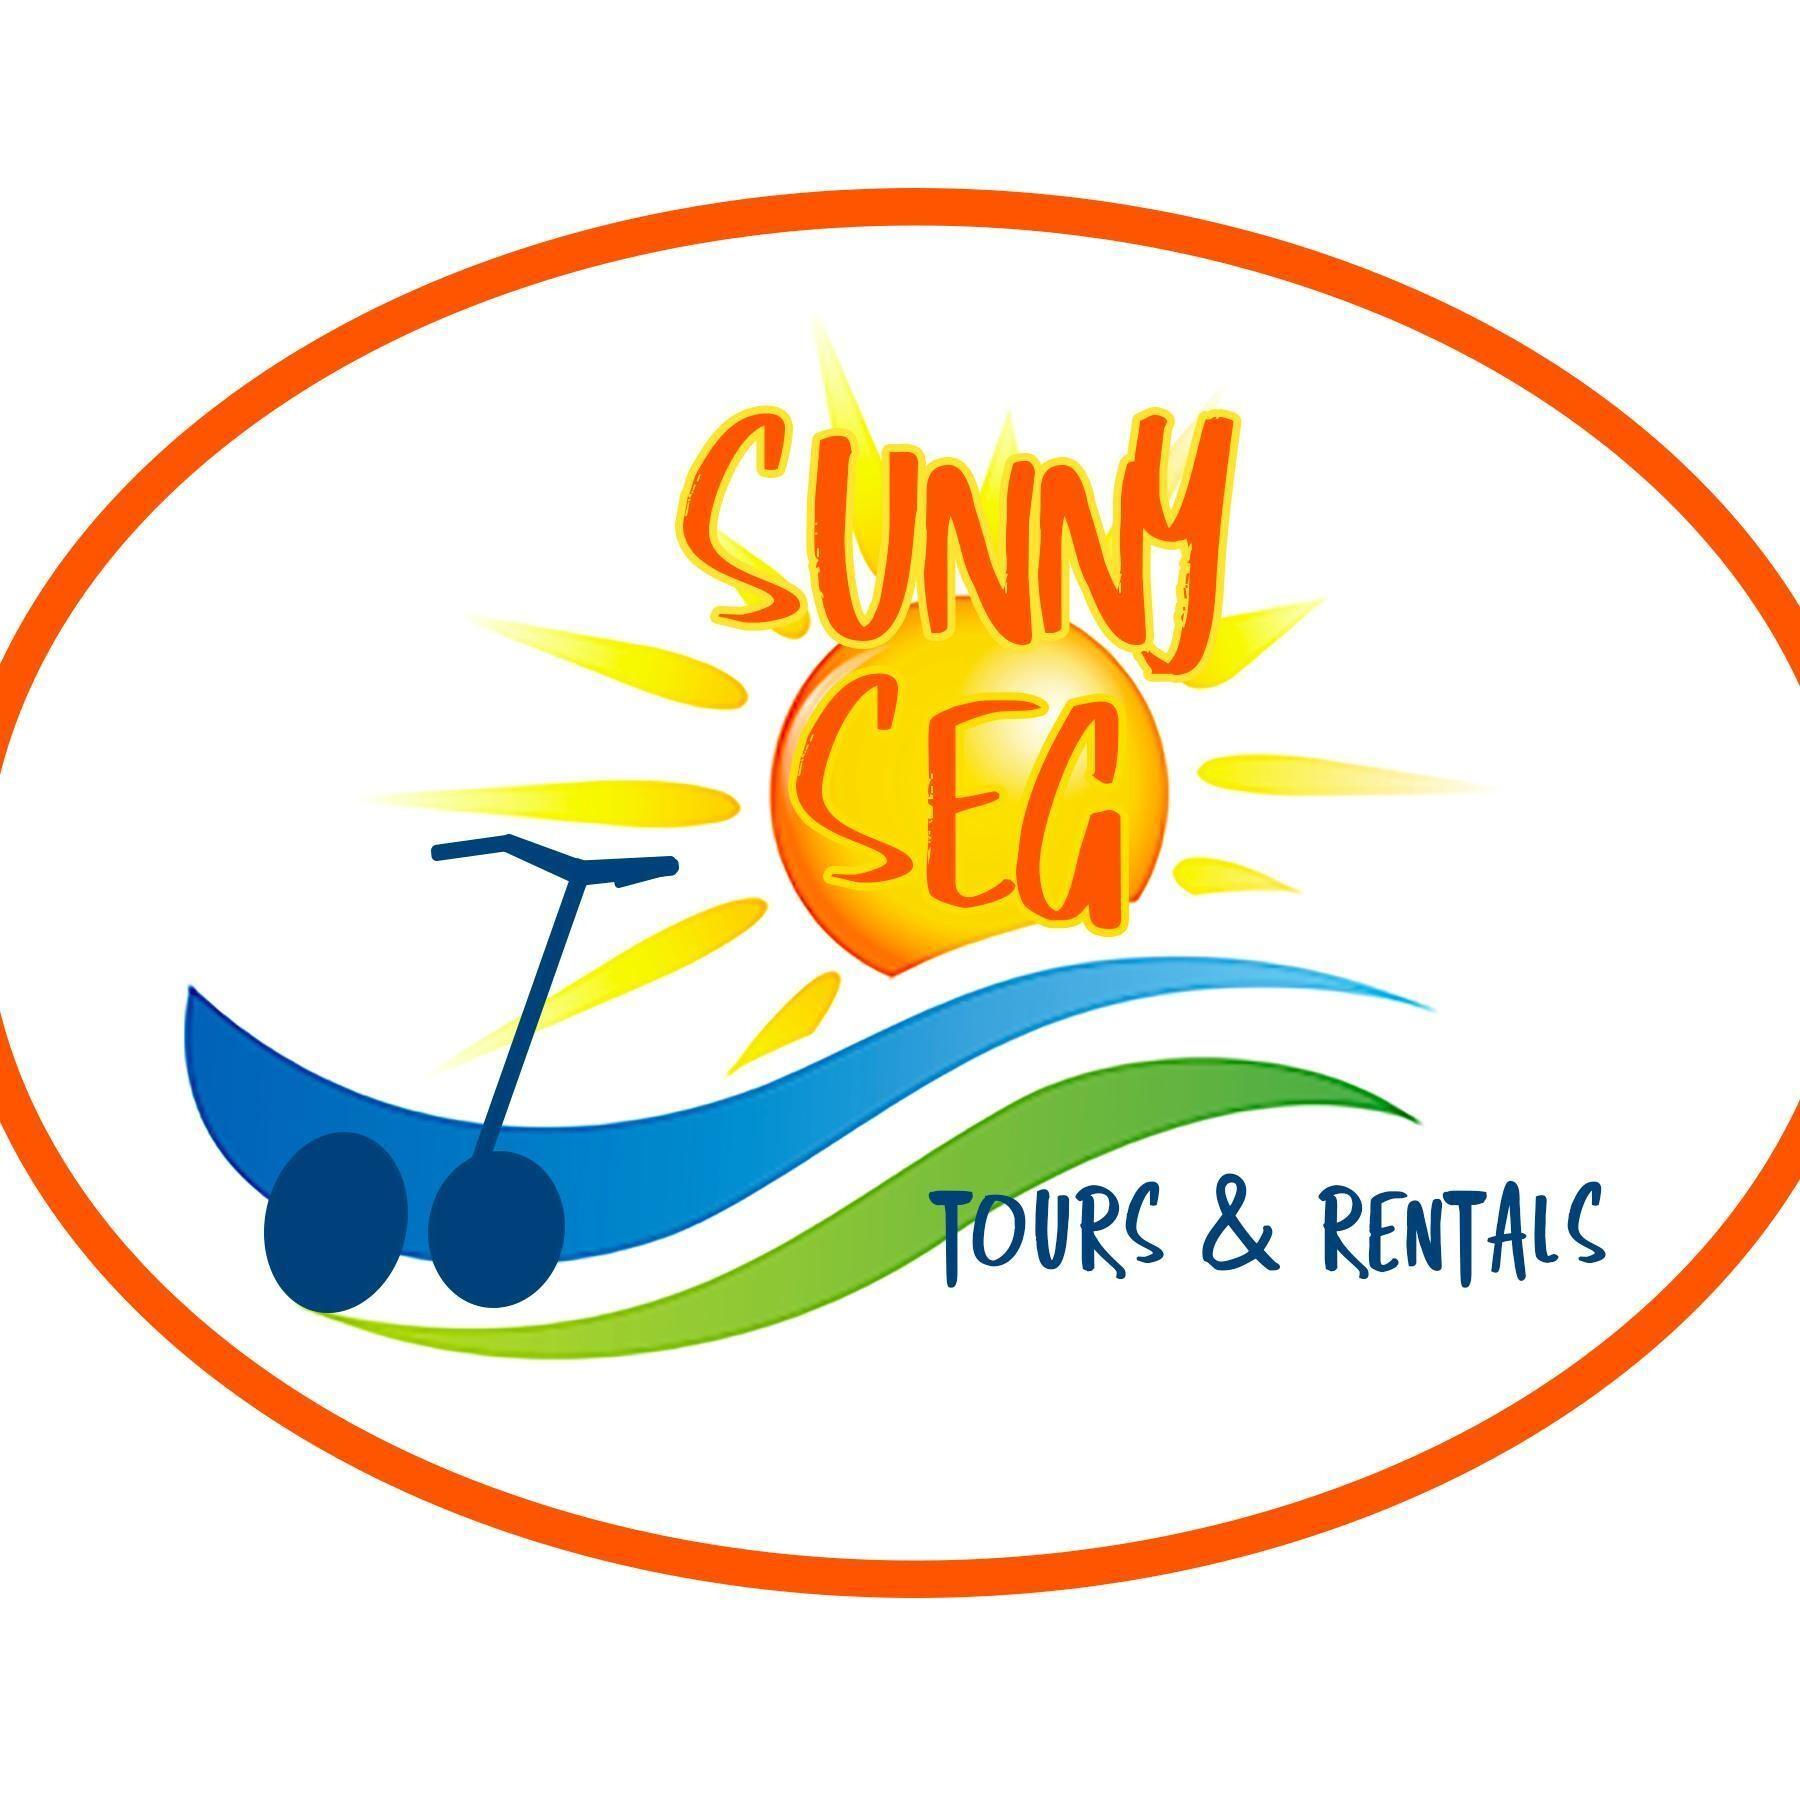 Sunny seg segway tours & rentals